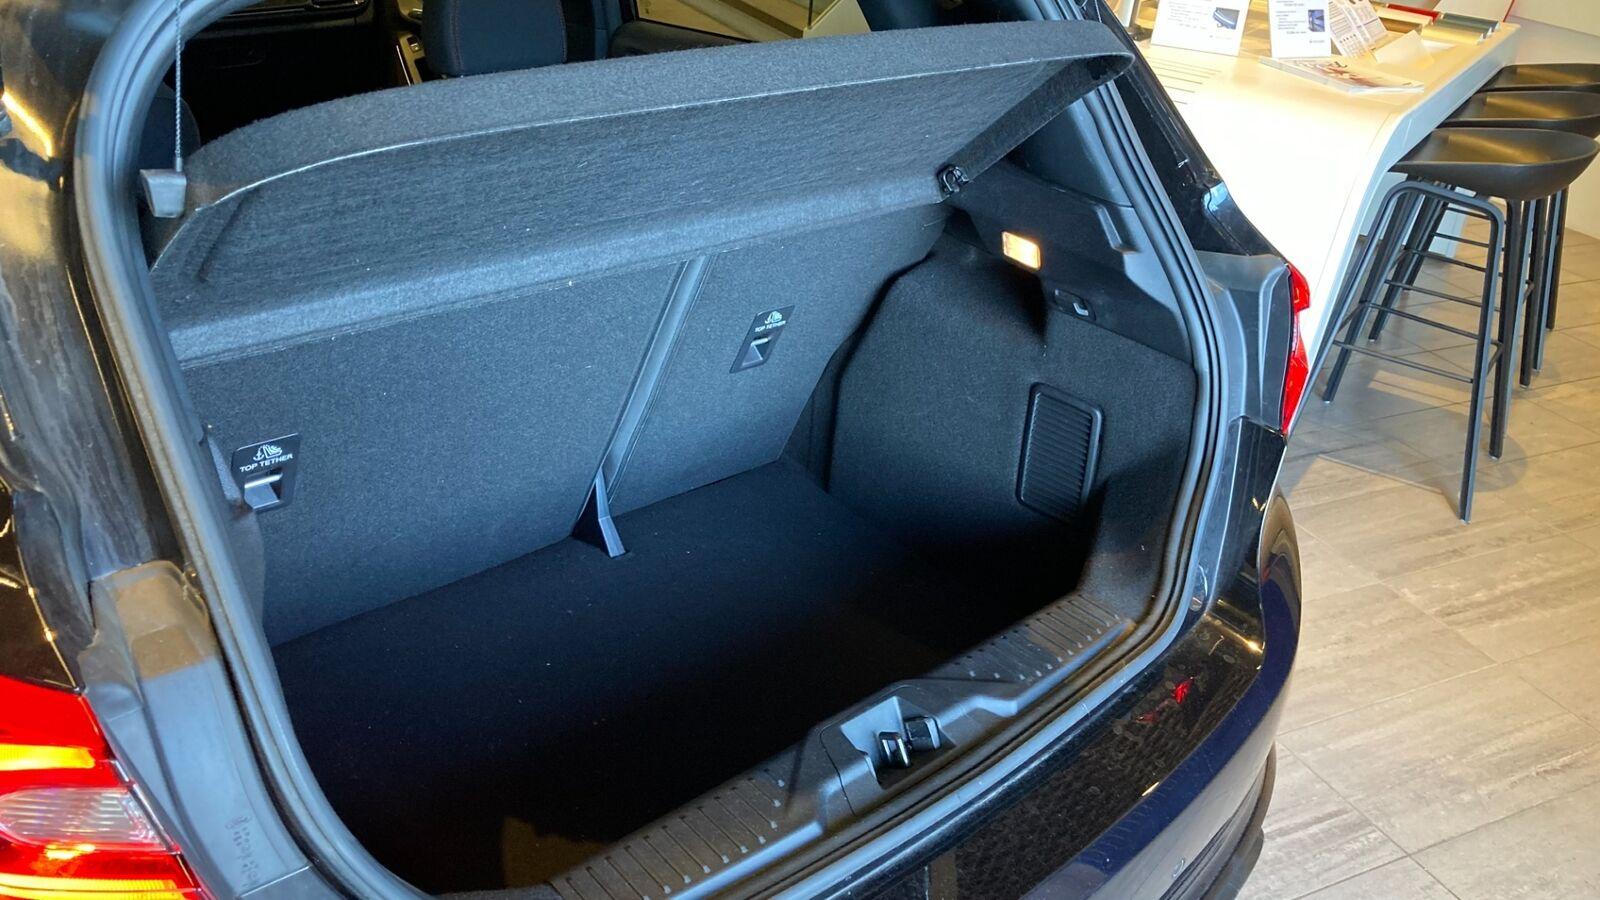 Ford Fiesta 1,5 TDCi 85 ST-Line X - billede 4